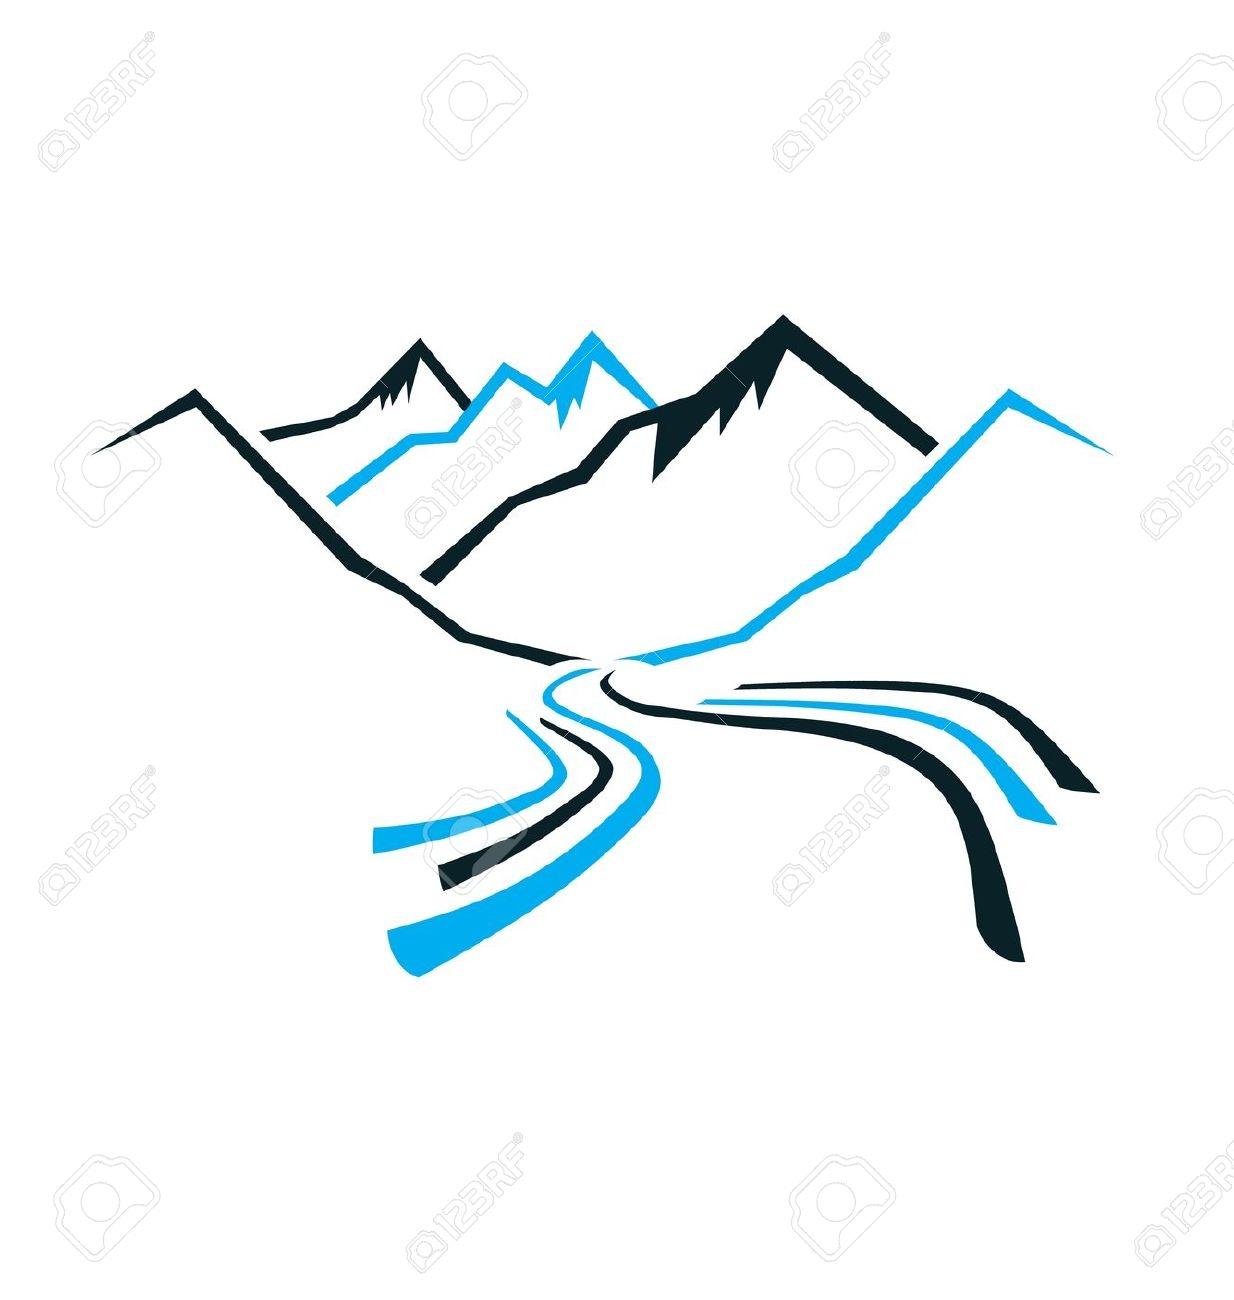 1234x1300 Mountain River Clipart Free Eclip Art